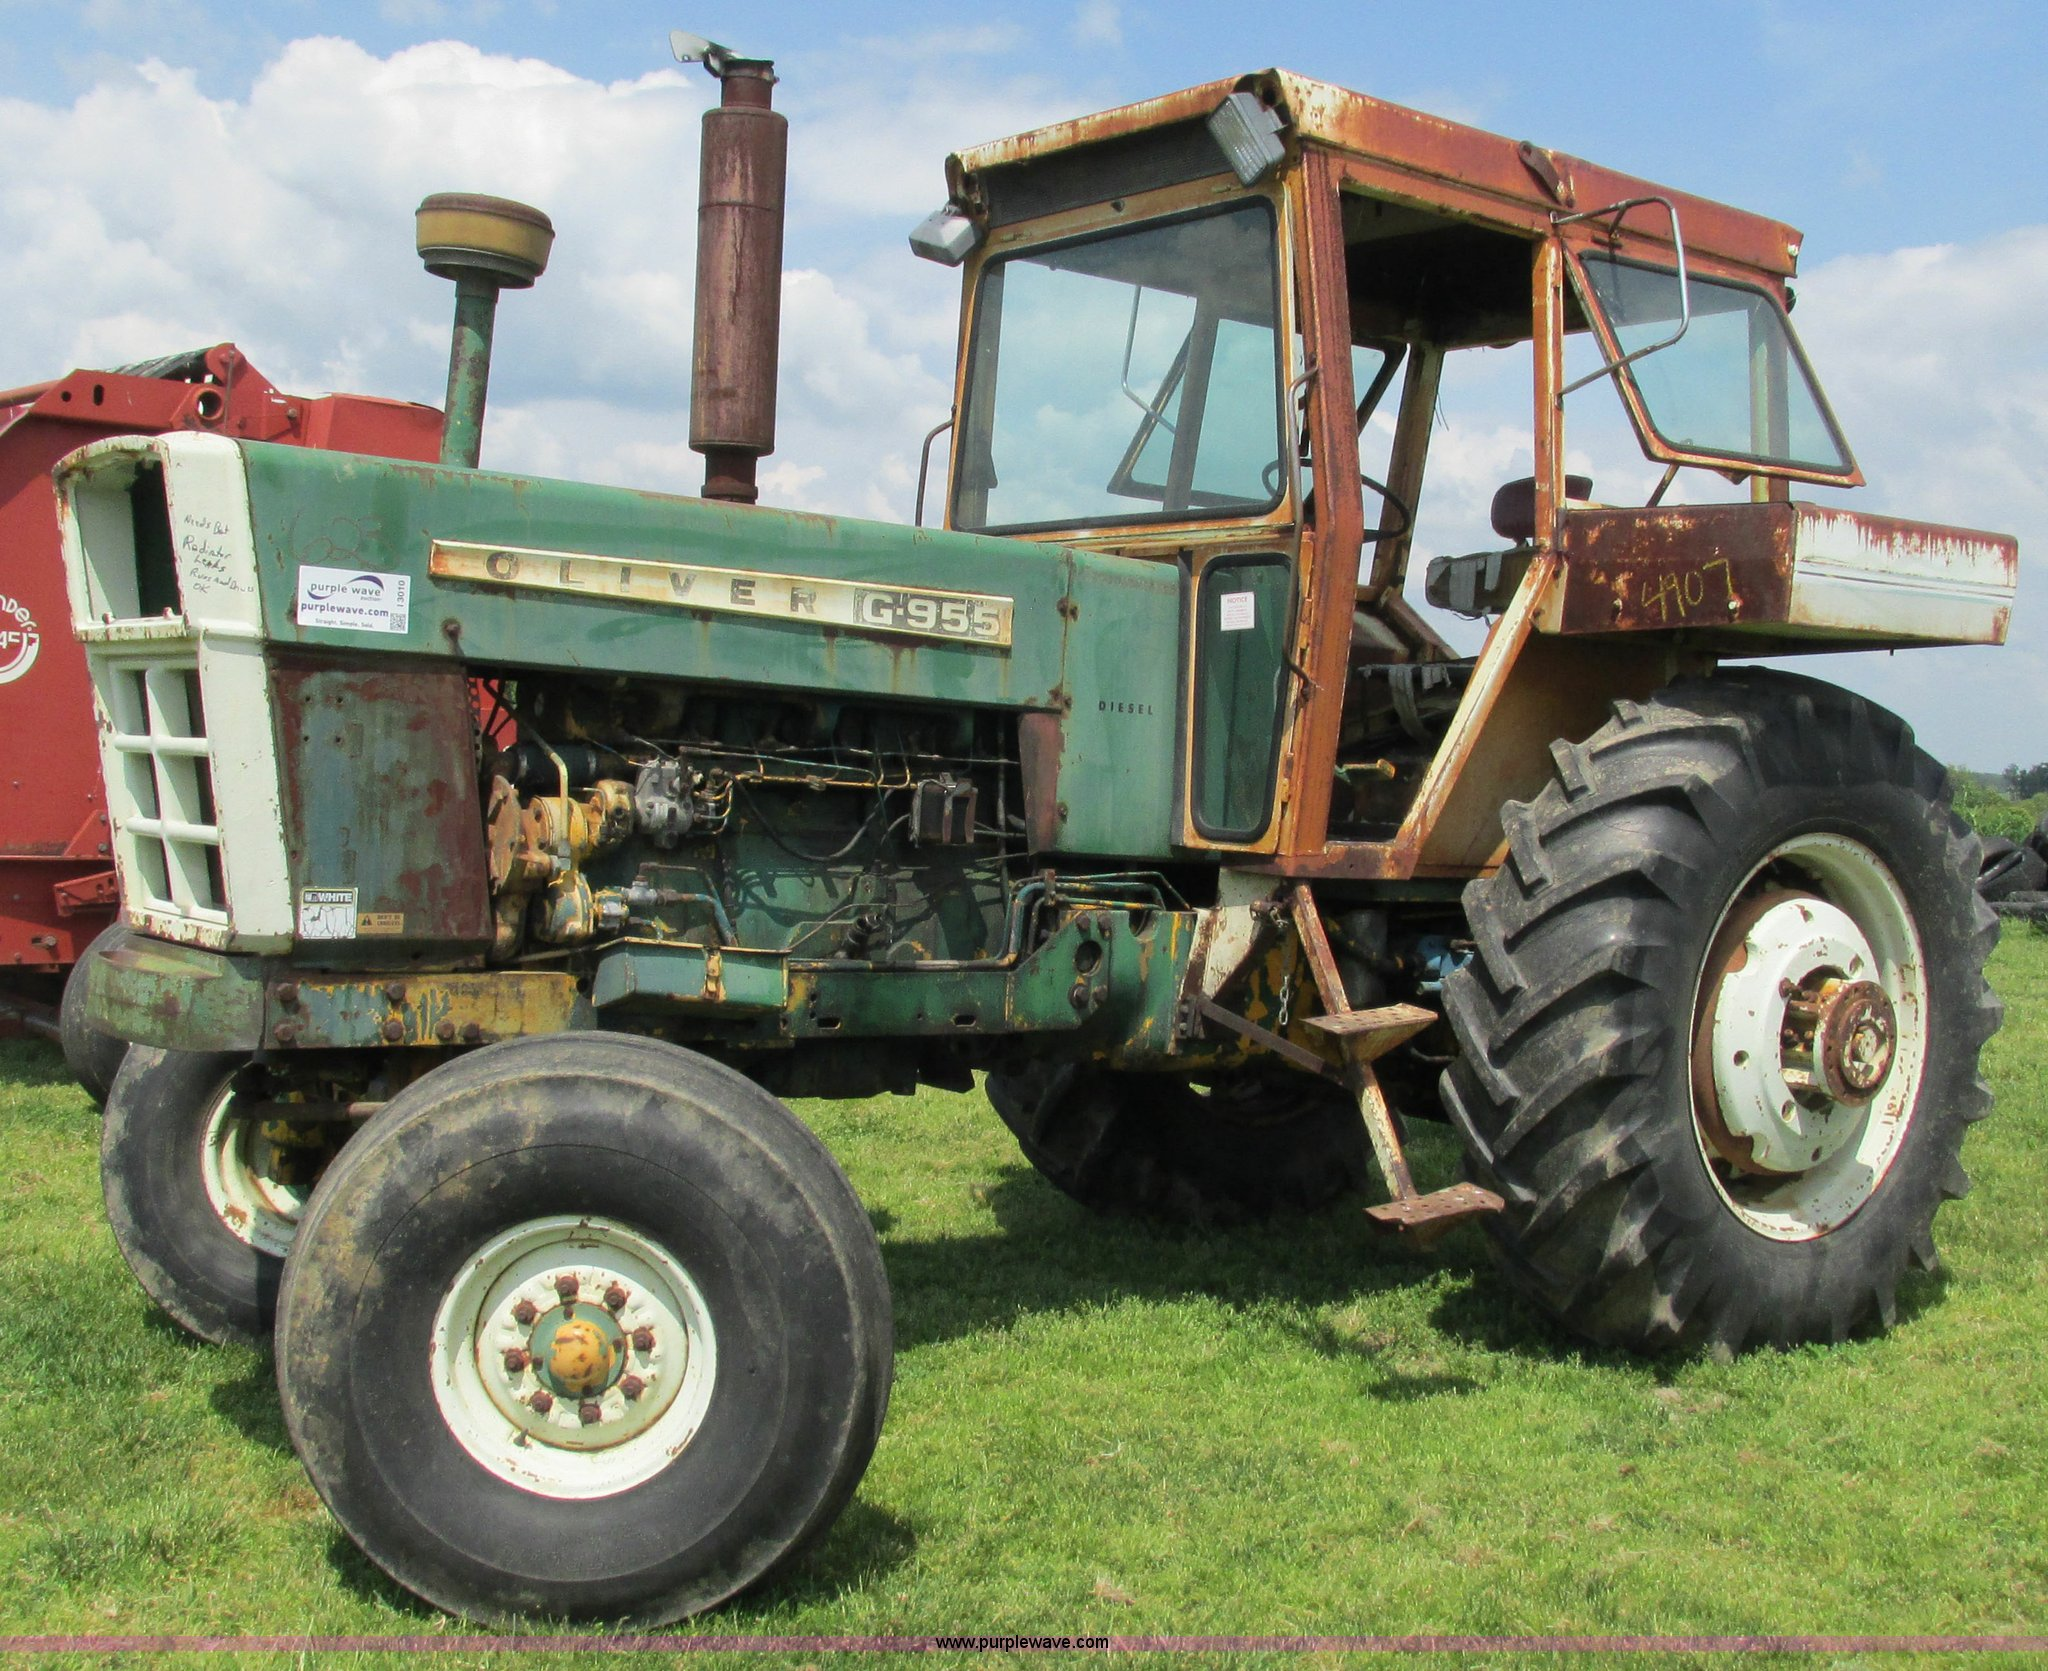 Oliver g955 22124 tractor item i3010 sold june 3 - Craigslist farm and garden minneapolis ...